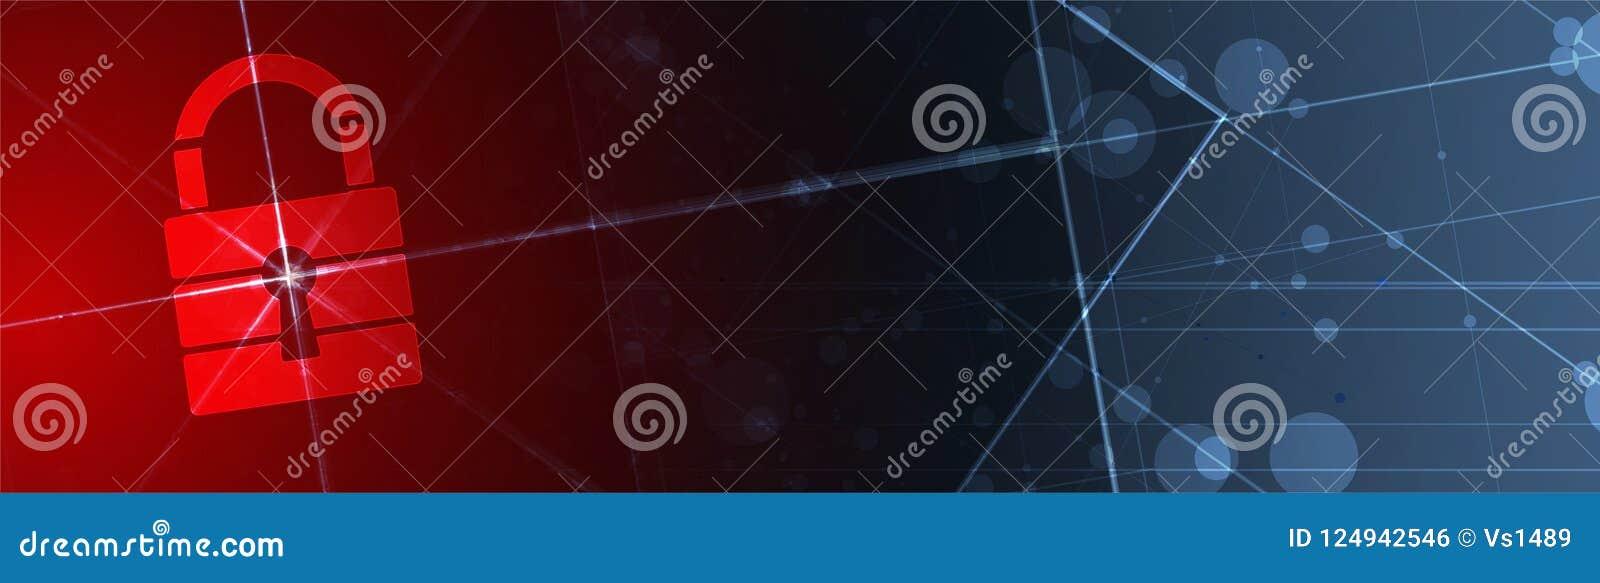 Cybersecurity και πληροφορίες ή προστασία δικτύων μελλοντική τεχνολογία